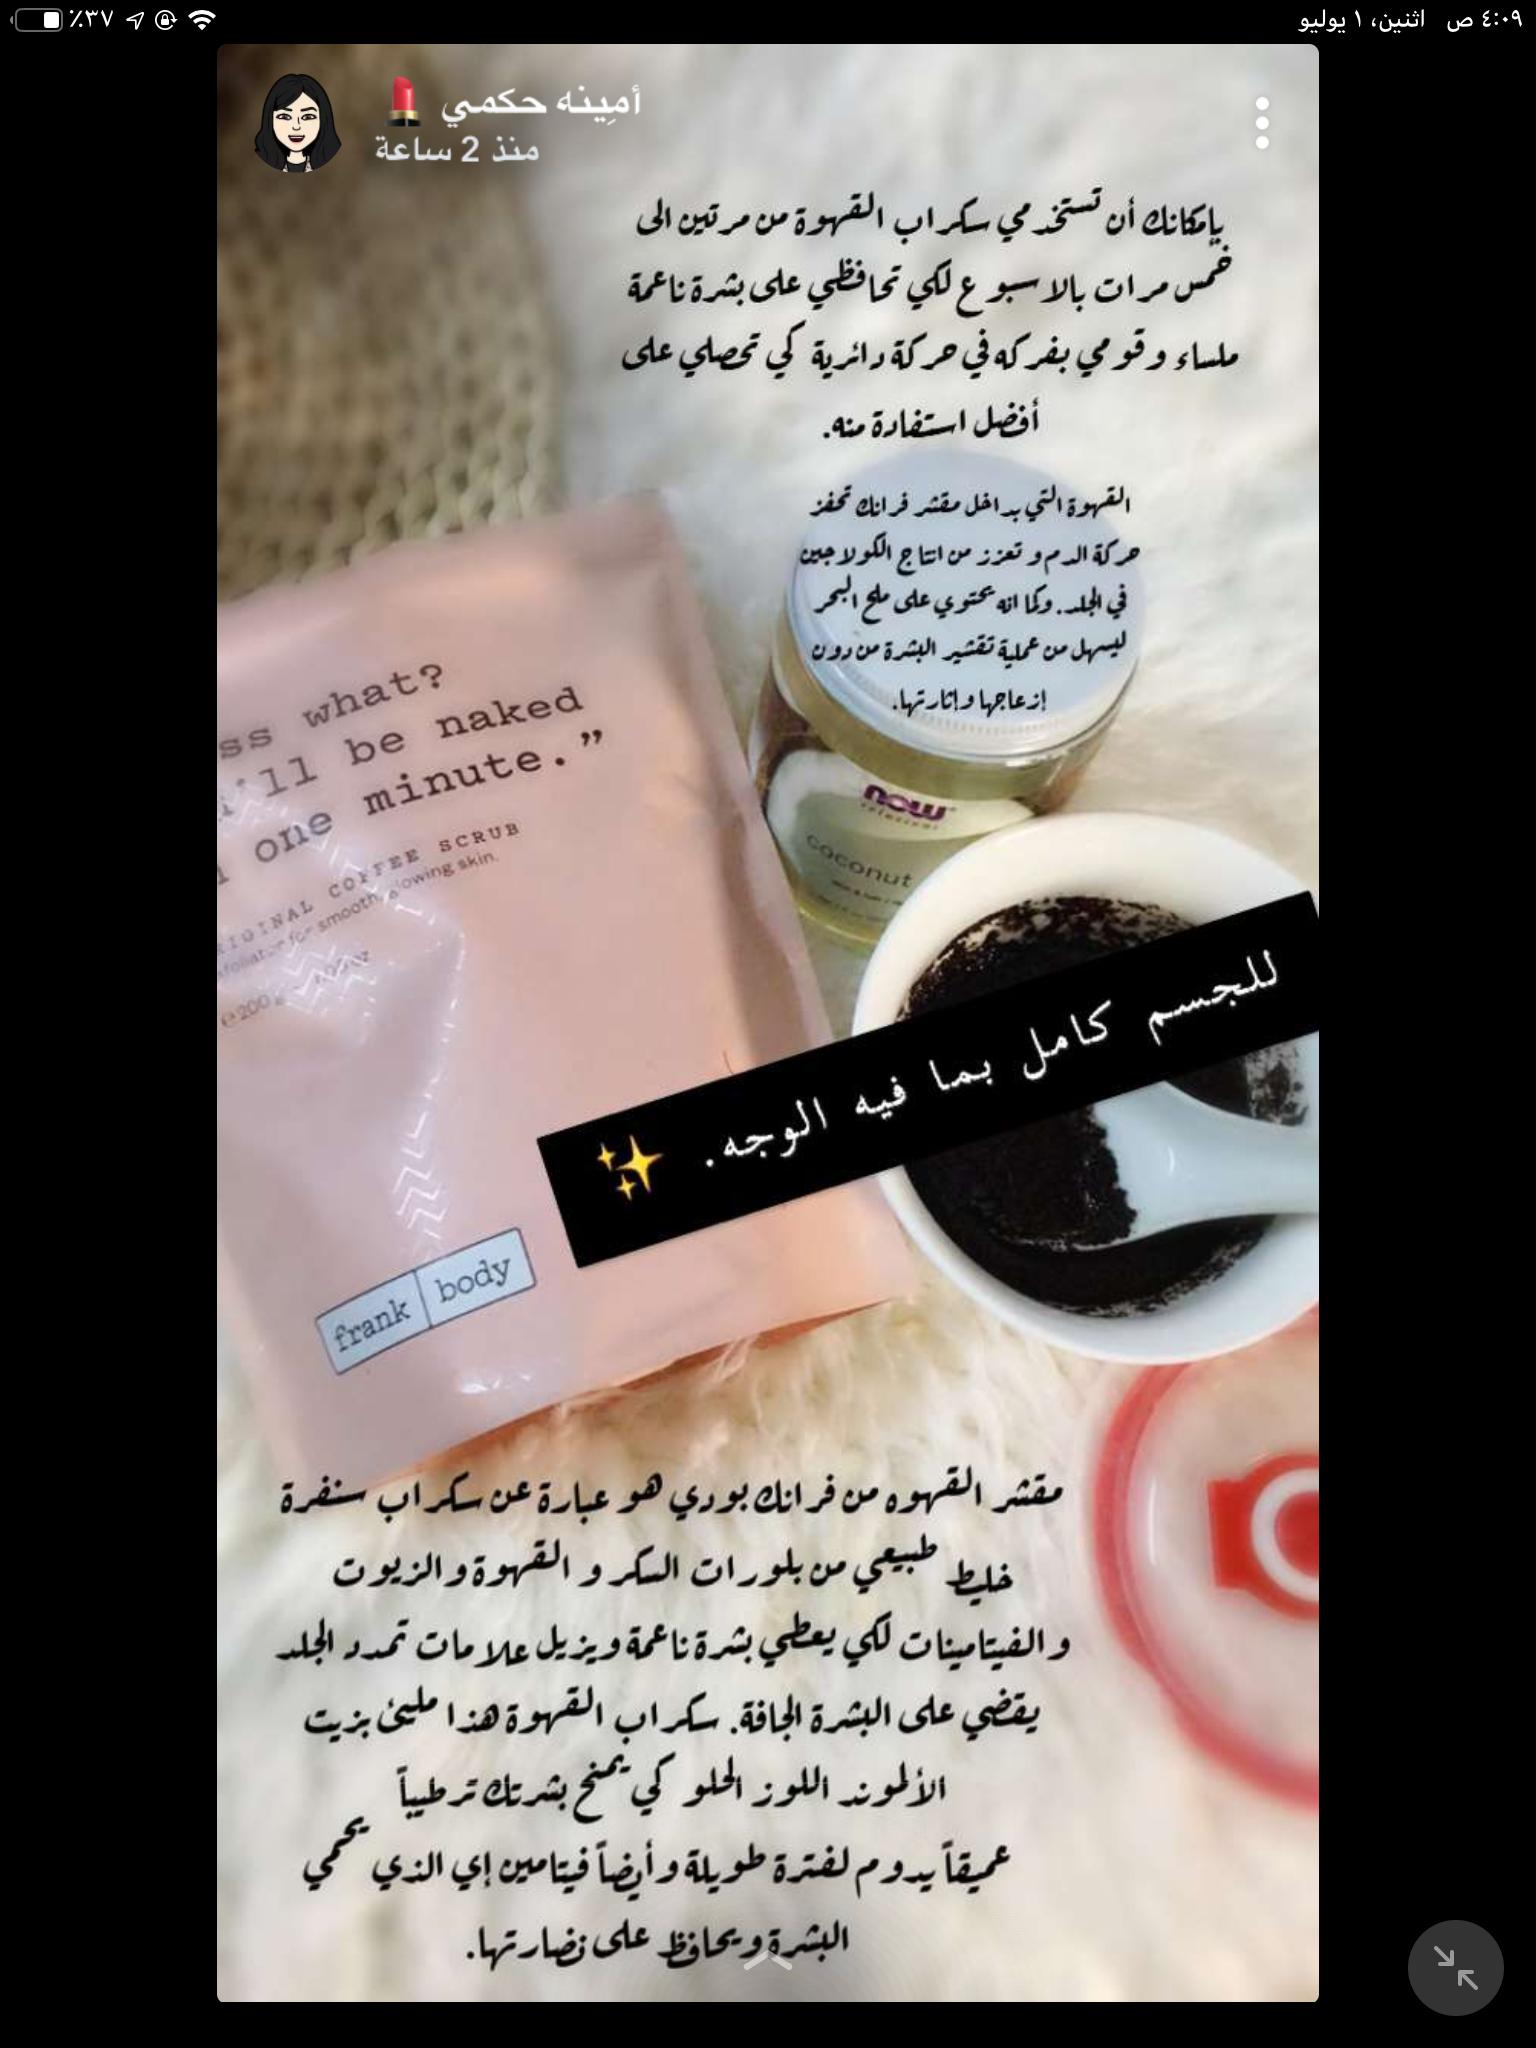 Homedecor Bts Jimin خلطات تجارب تجهيزات عروس عناية جمال بنات Beauty Hacks Cards Against Humanity Body